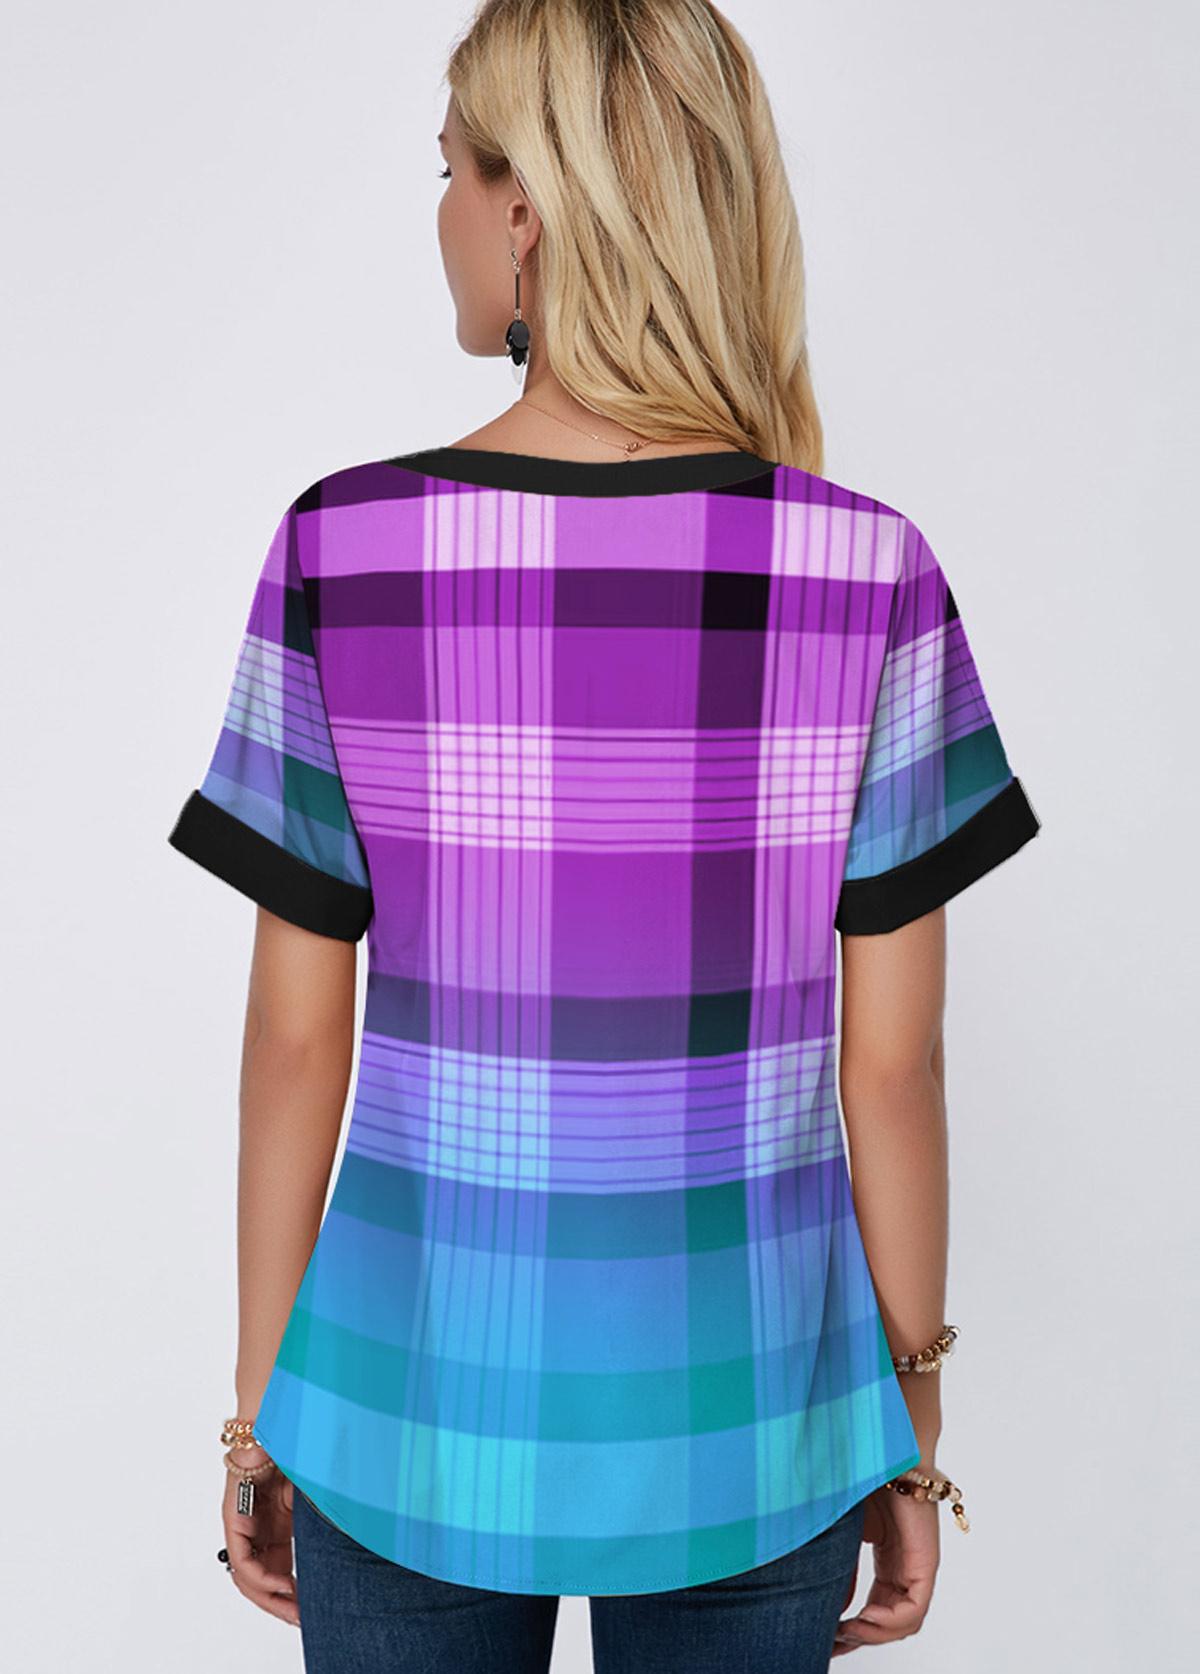 Lace Up Plaid Print Short Sleeve Blouse